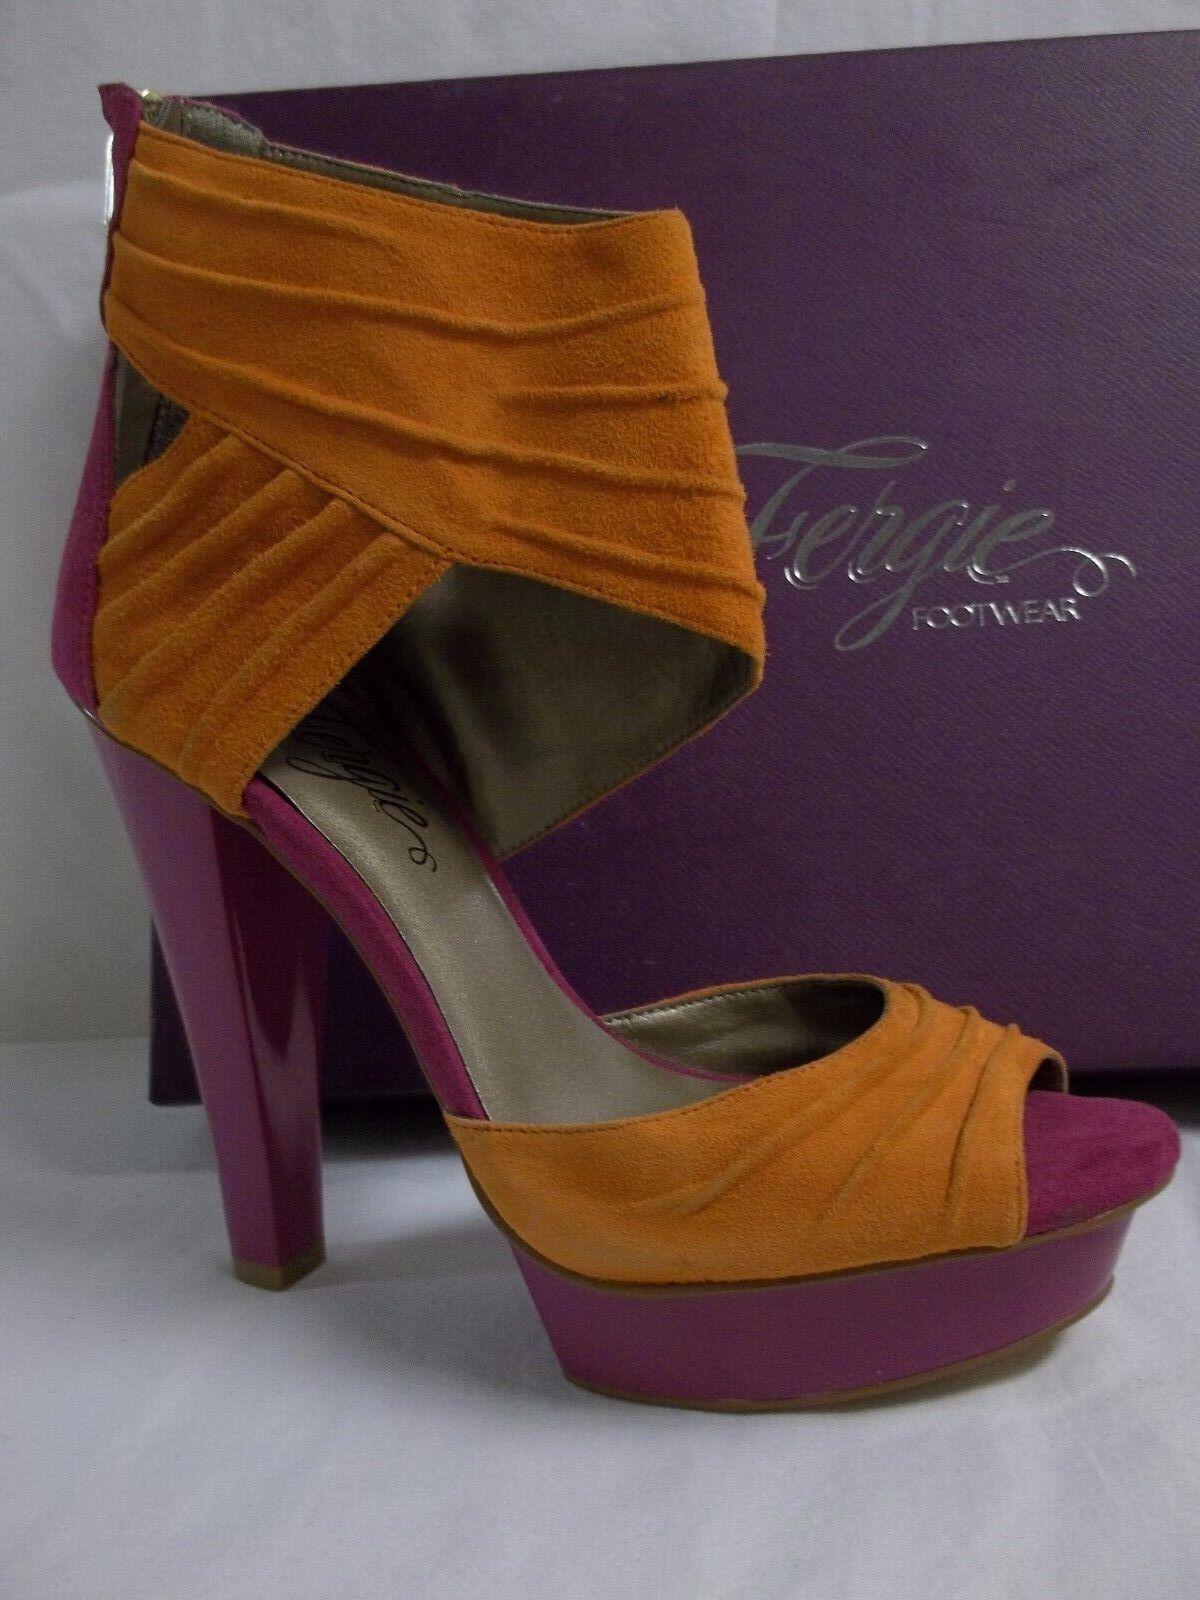 Fergie Größe 7 M Chipper Fuchsia Leder Open Toe Heels NEU Damenschuhe Schuhes